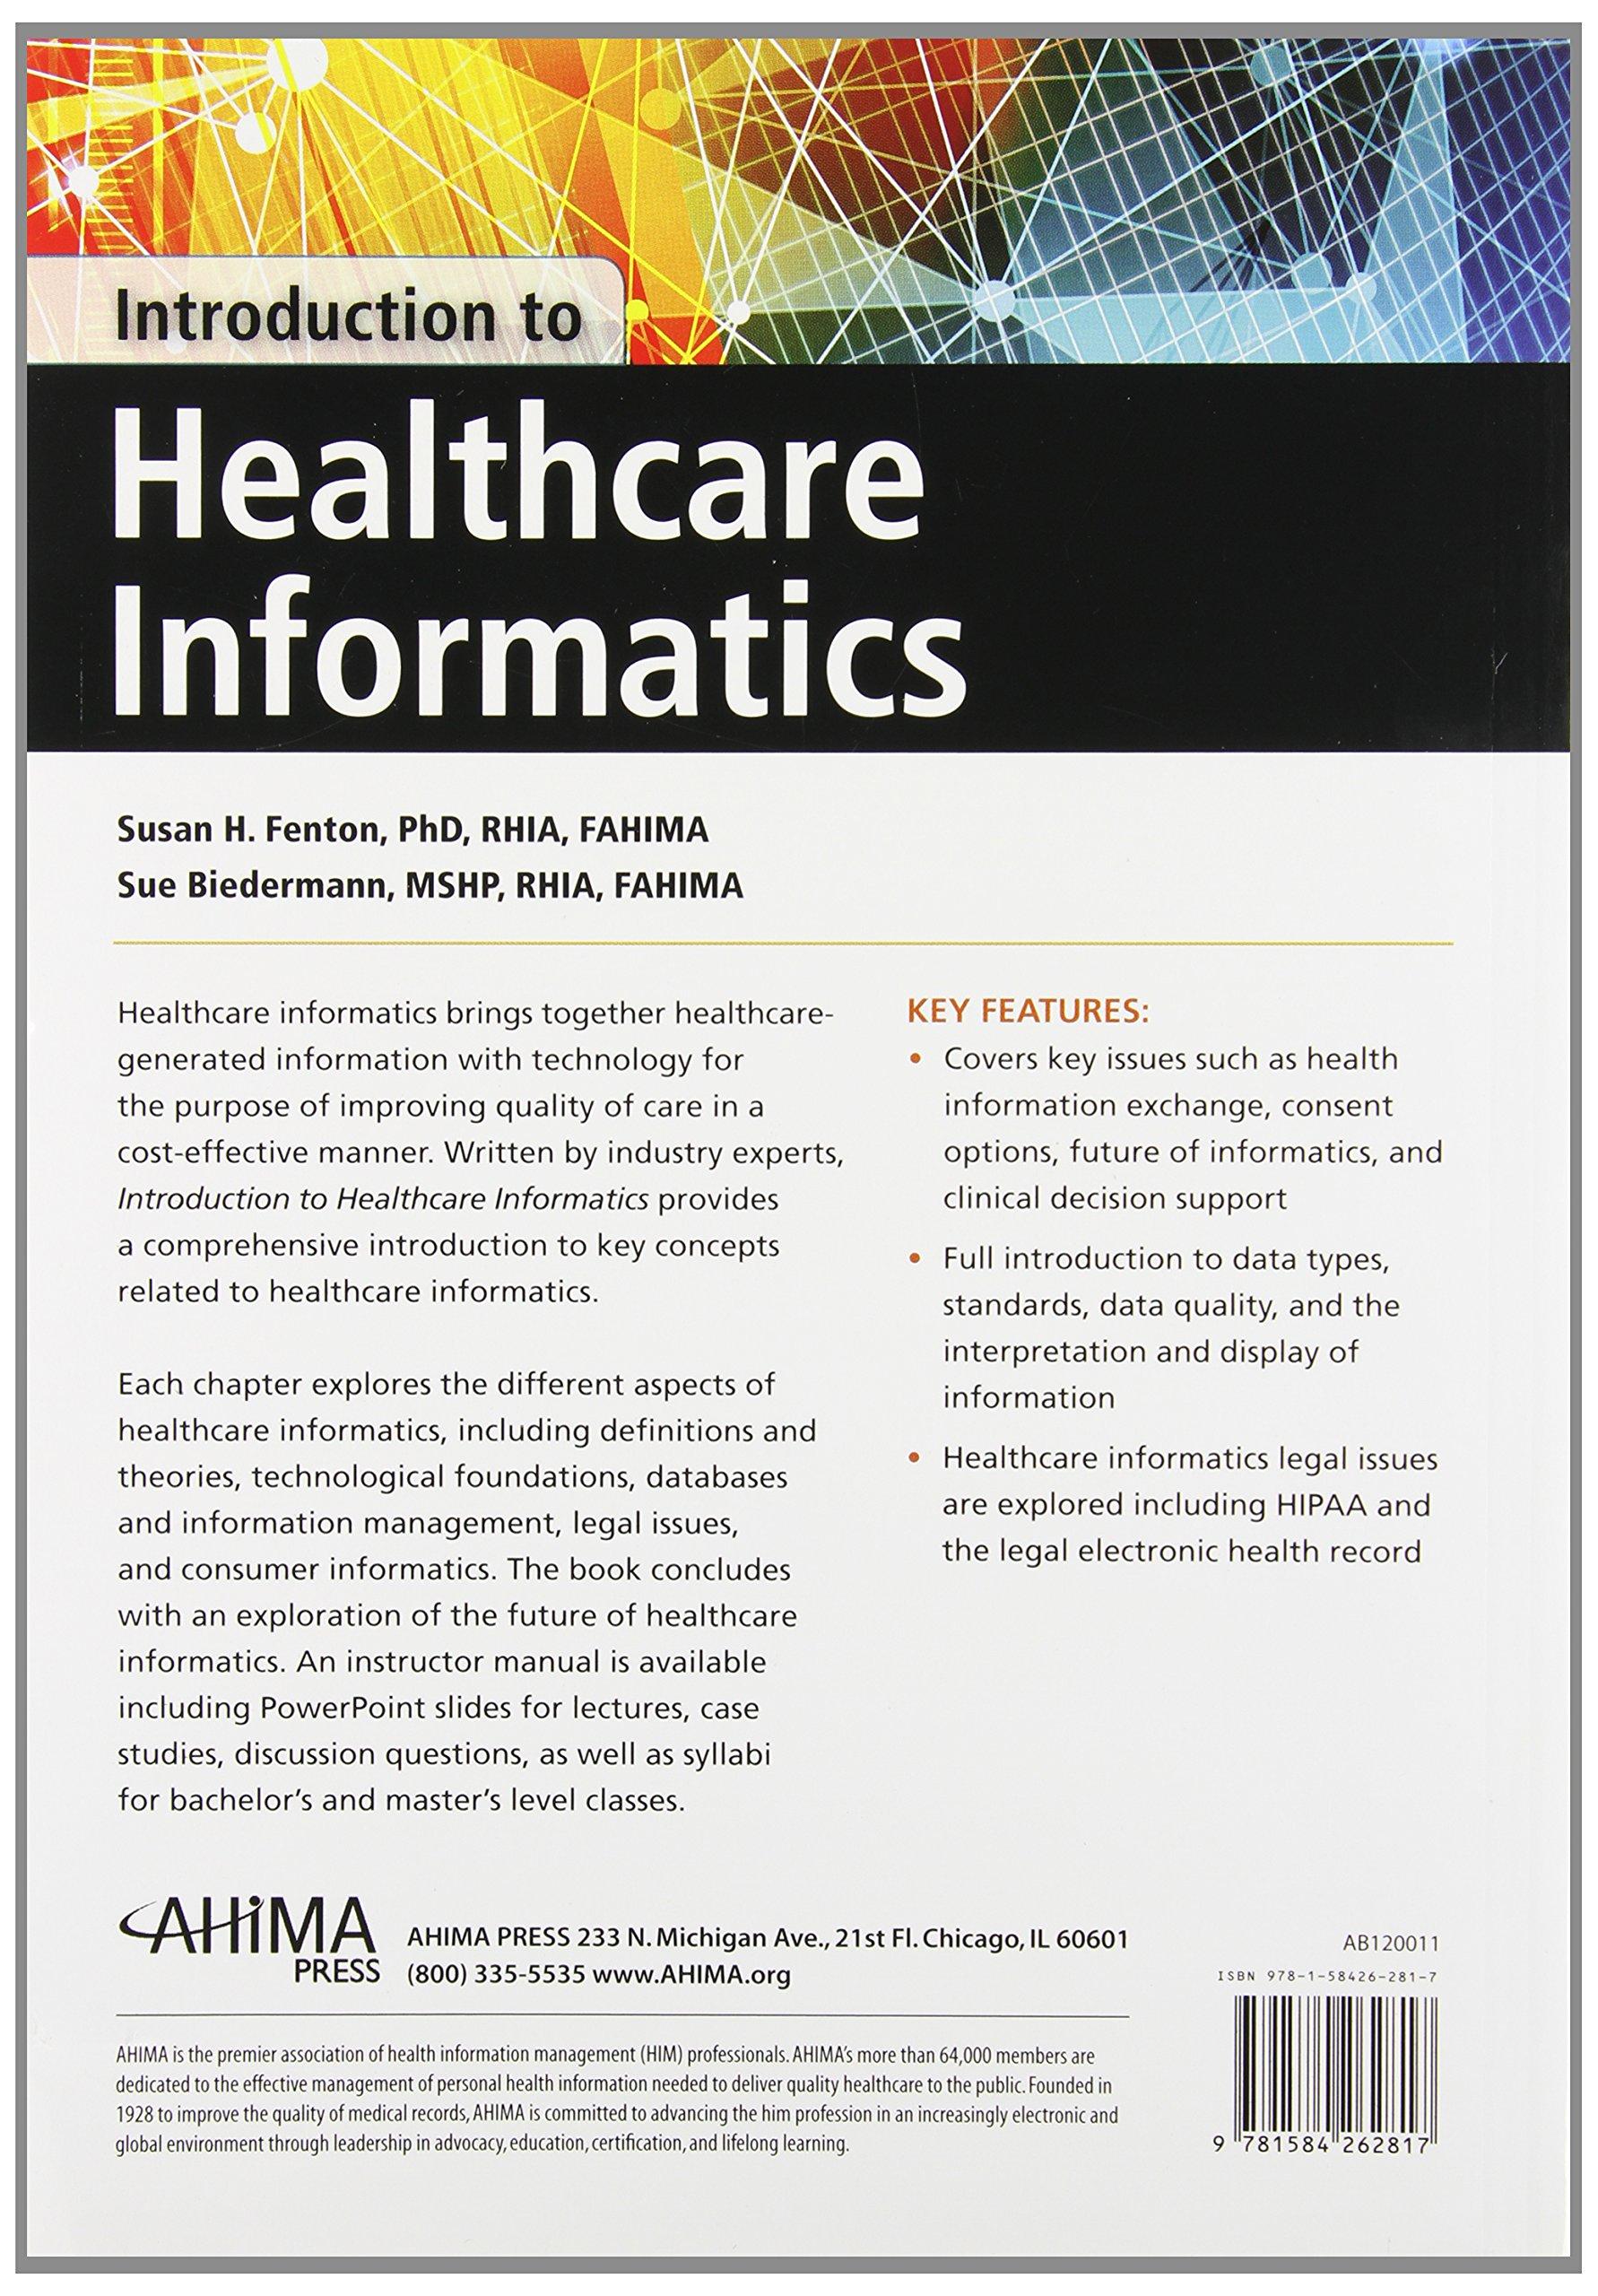 Free Professional Resume Healthcare Informatics Certification